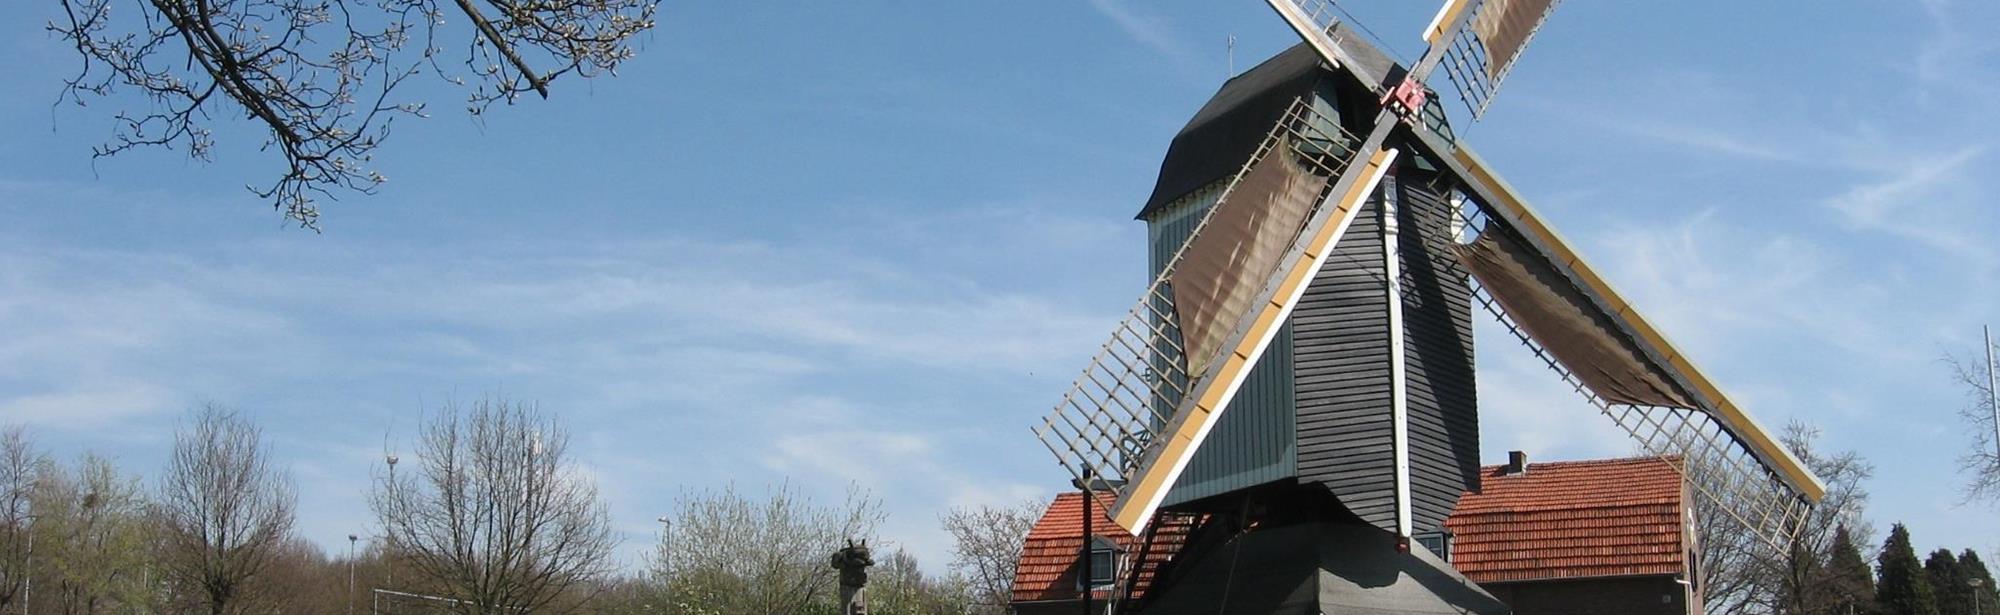 Standerd molen Urmond